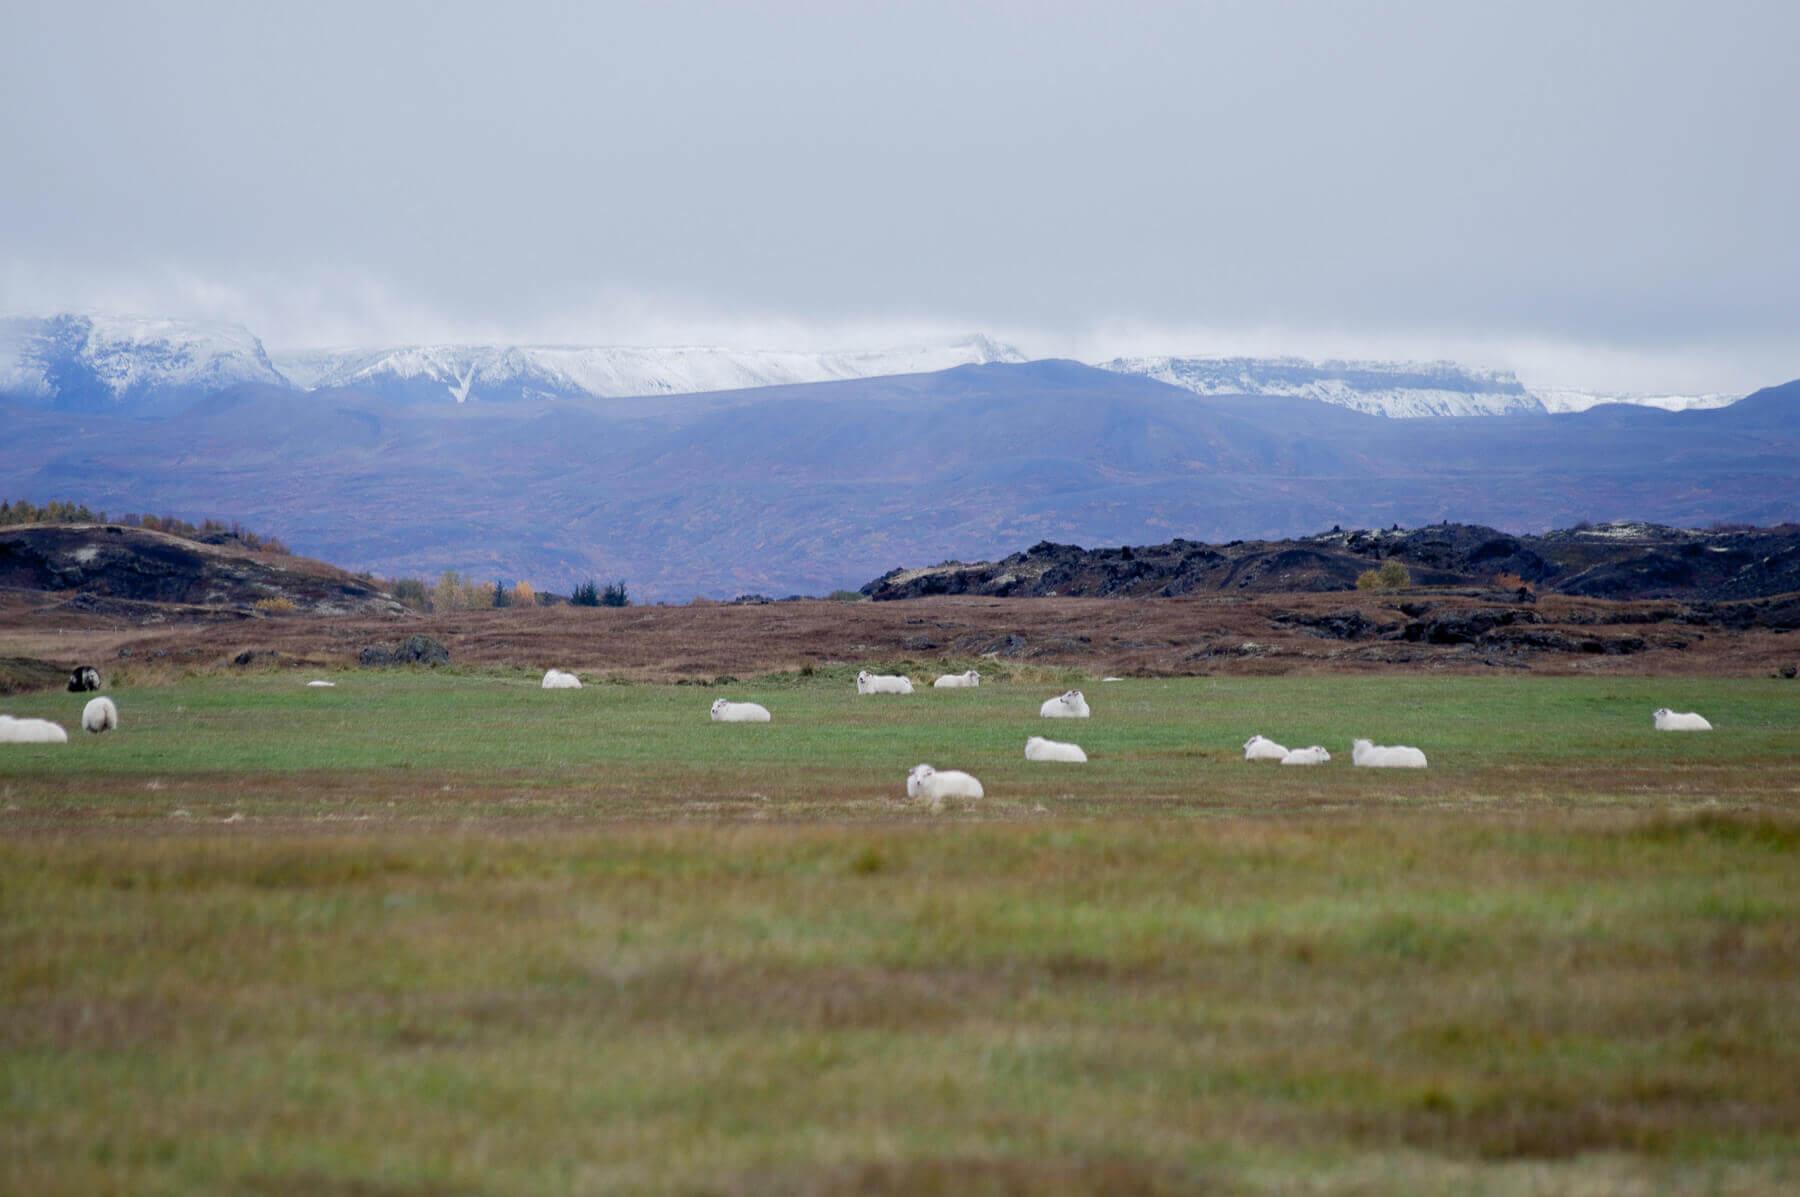 A herd of Icelandic Sheep in a big field